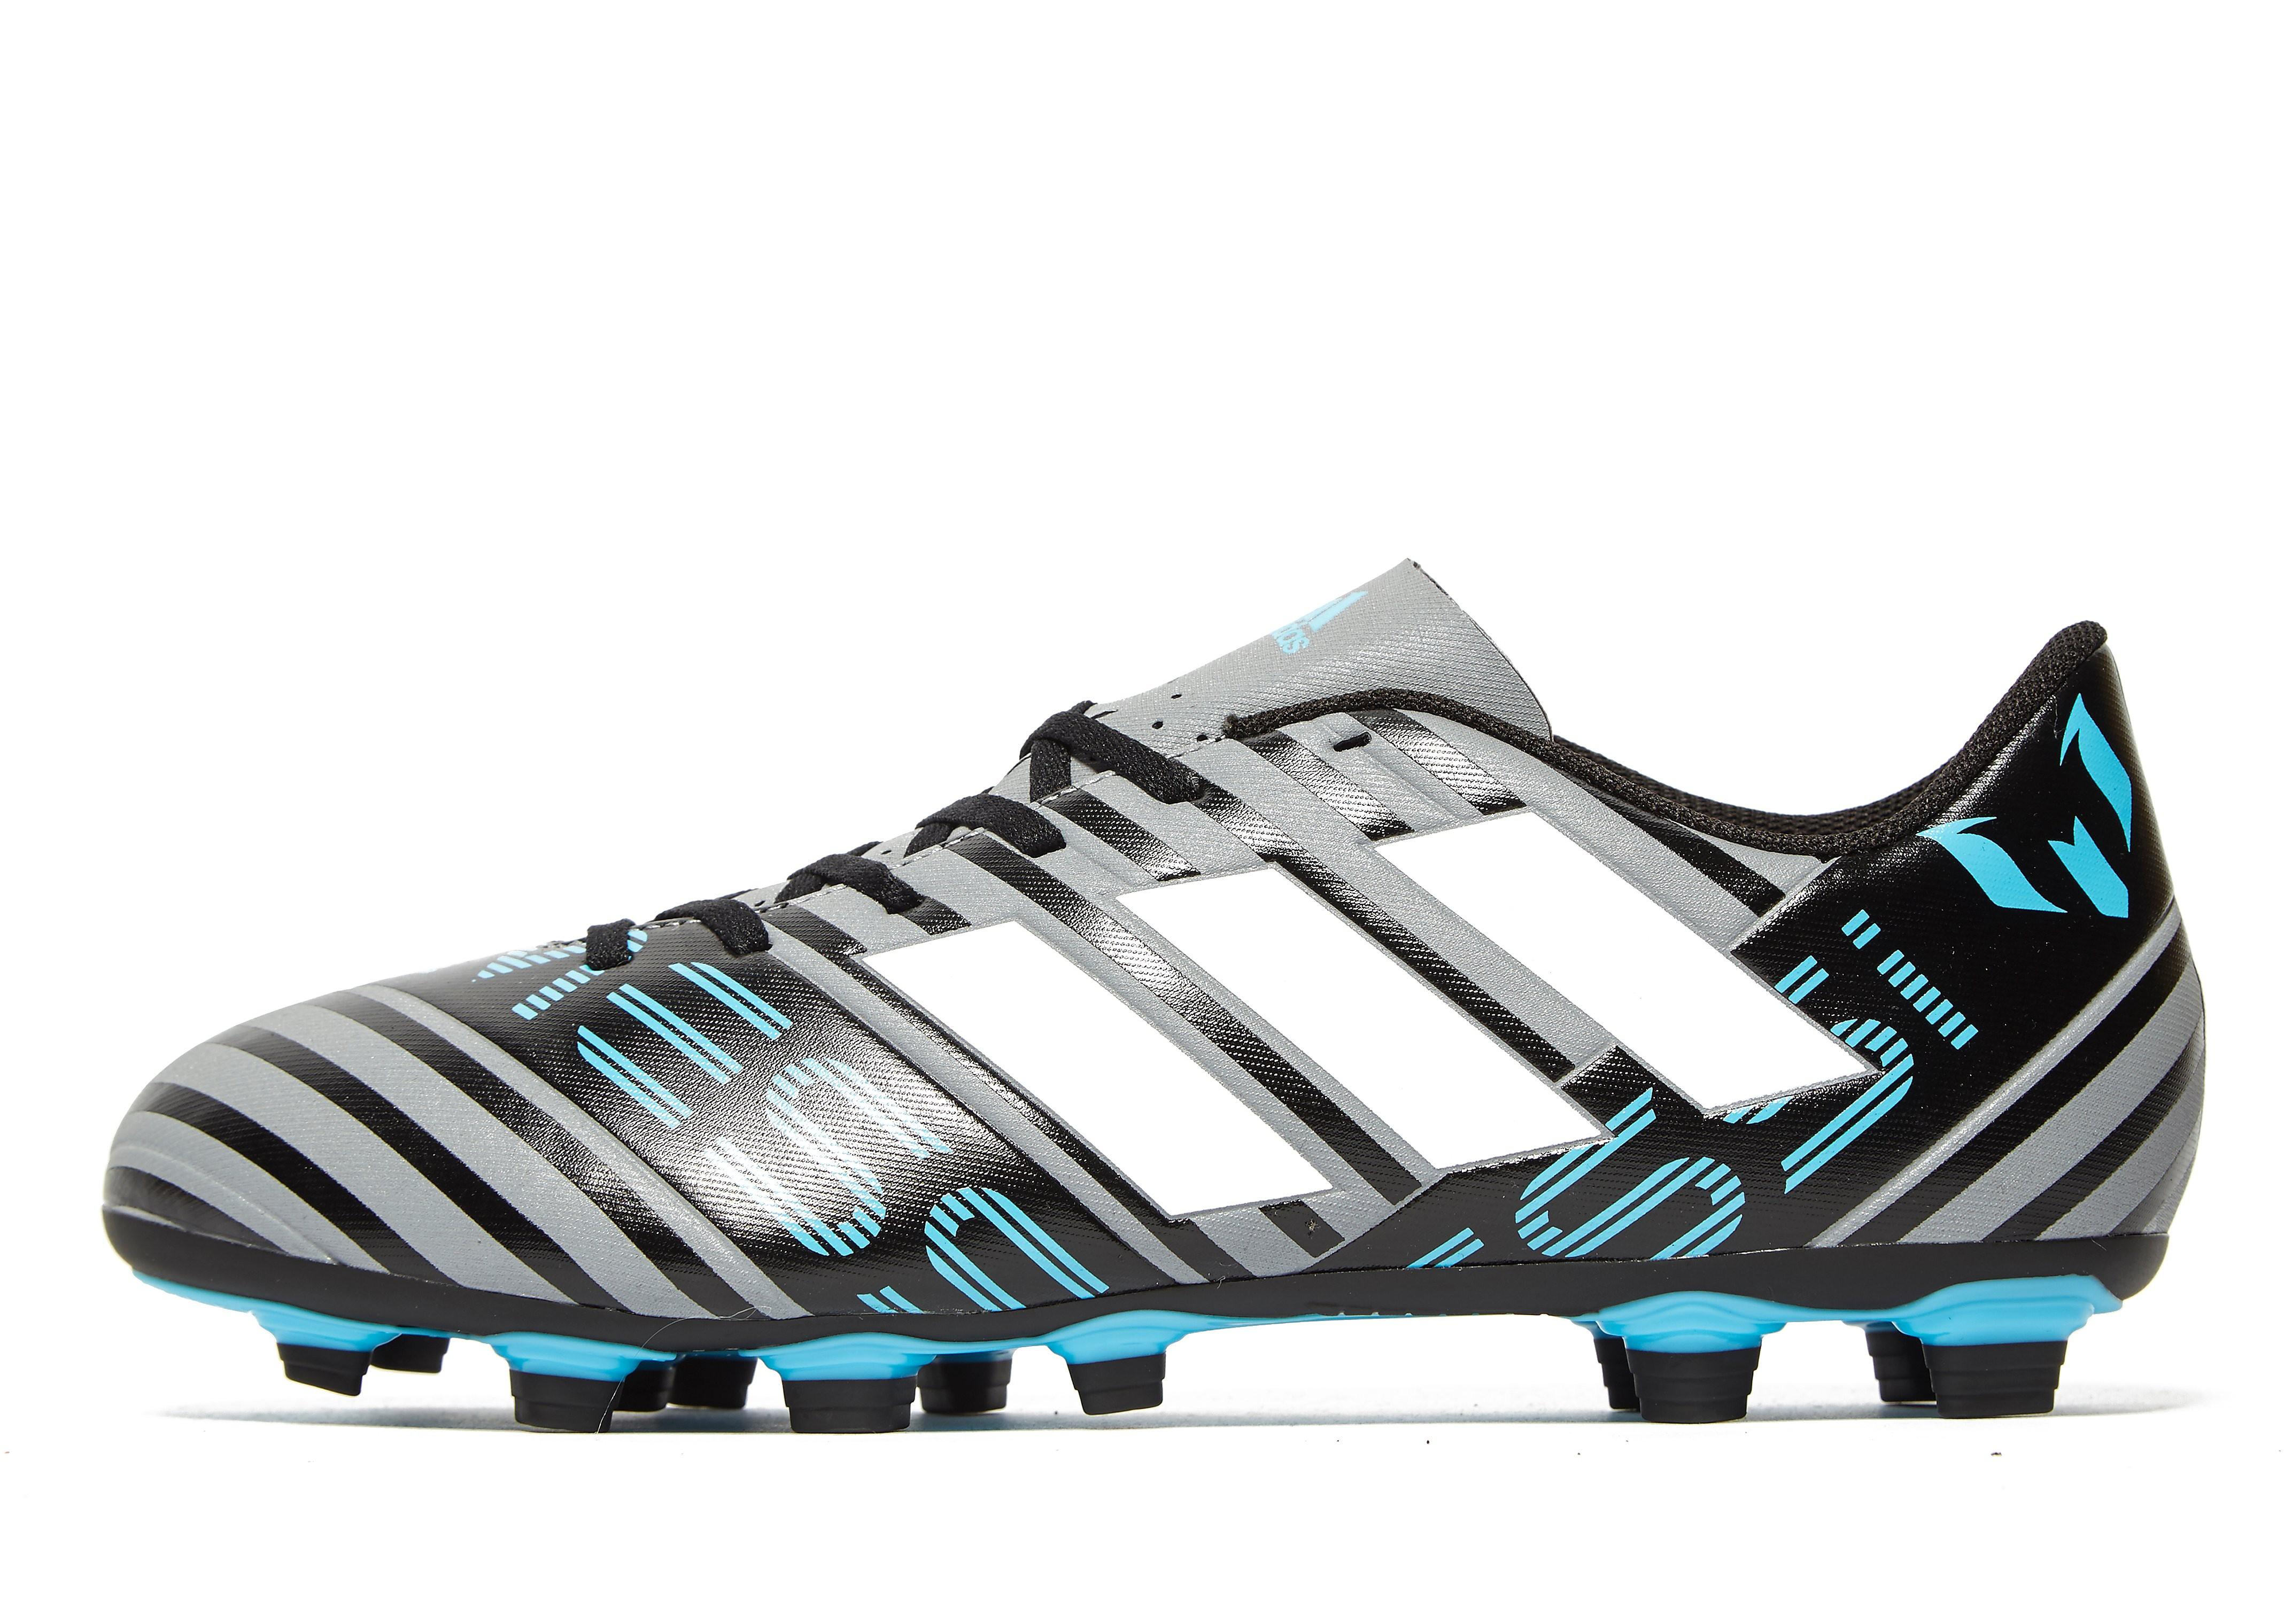 adidas Cold Blooded Nemeziz Messi 17.4 FG